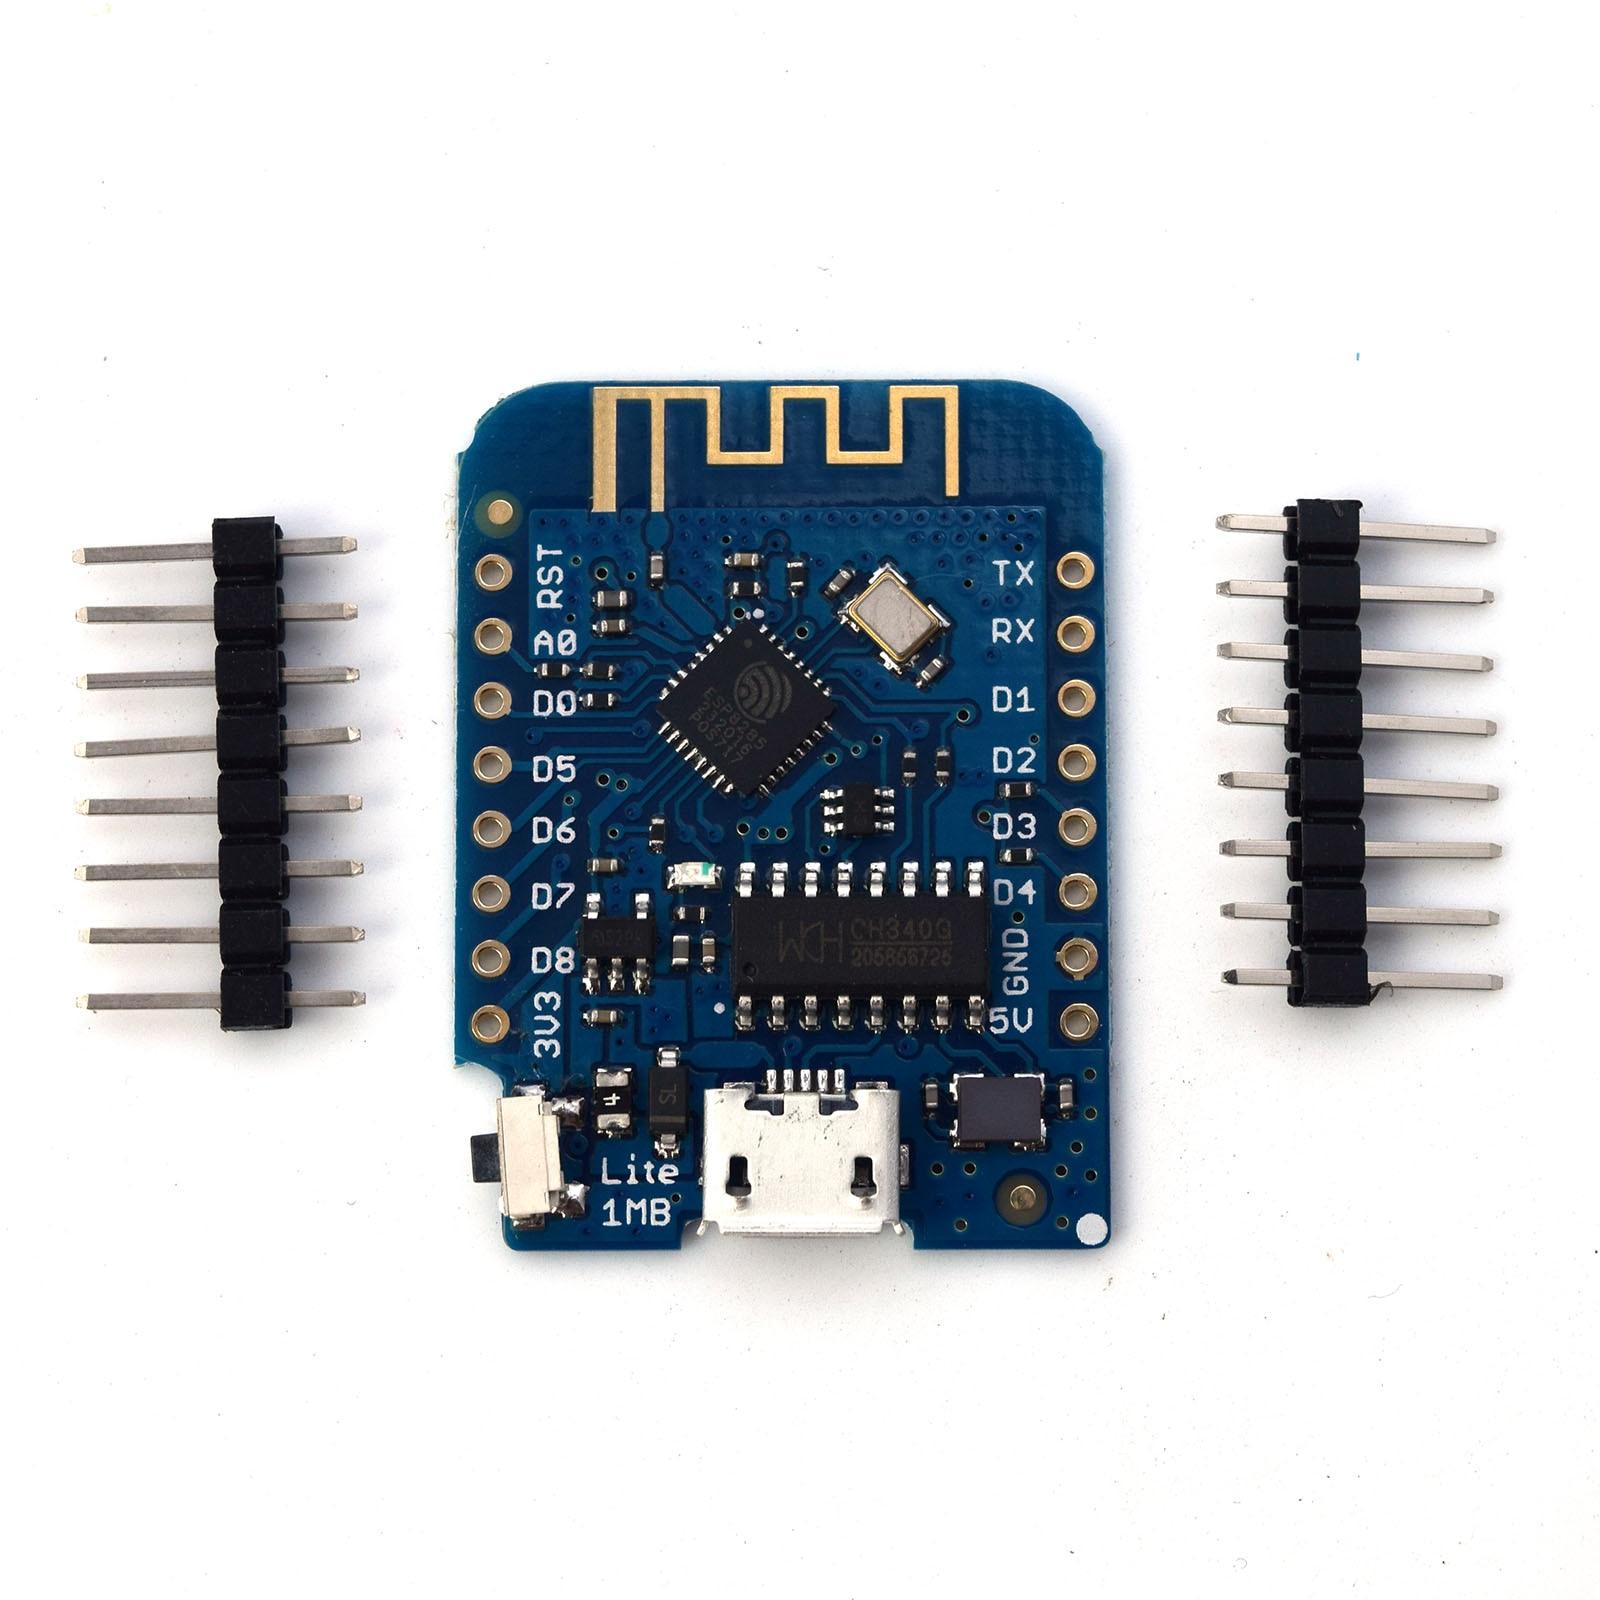 WiFi Internet of Things Development Board Based ESP8285 1MB Flash for WEMOS D1 Mini Lite V1.0.0